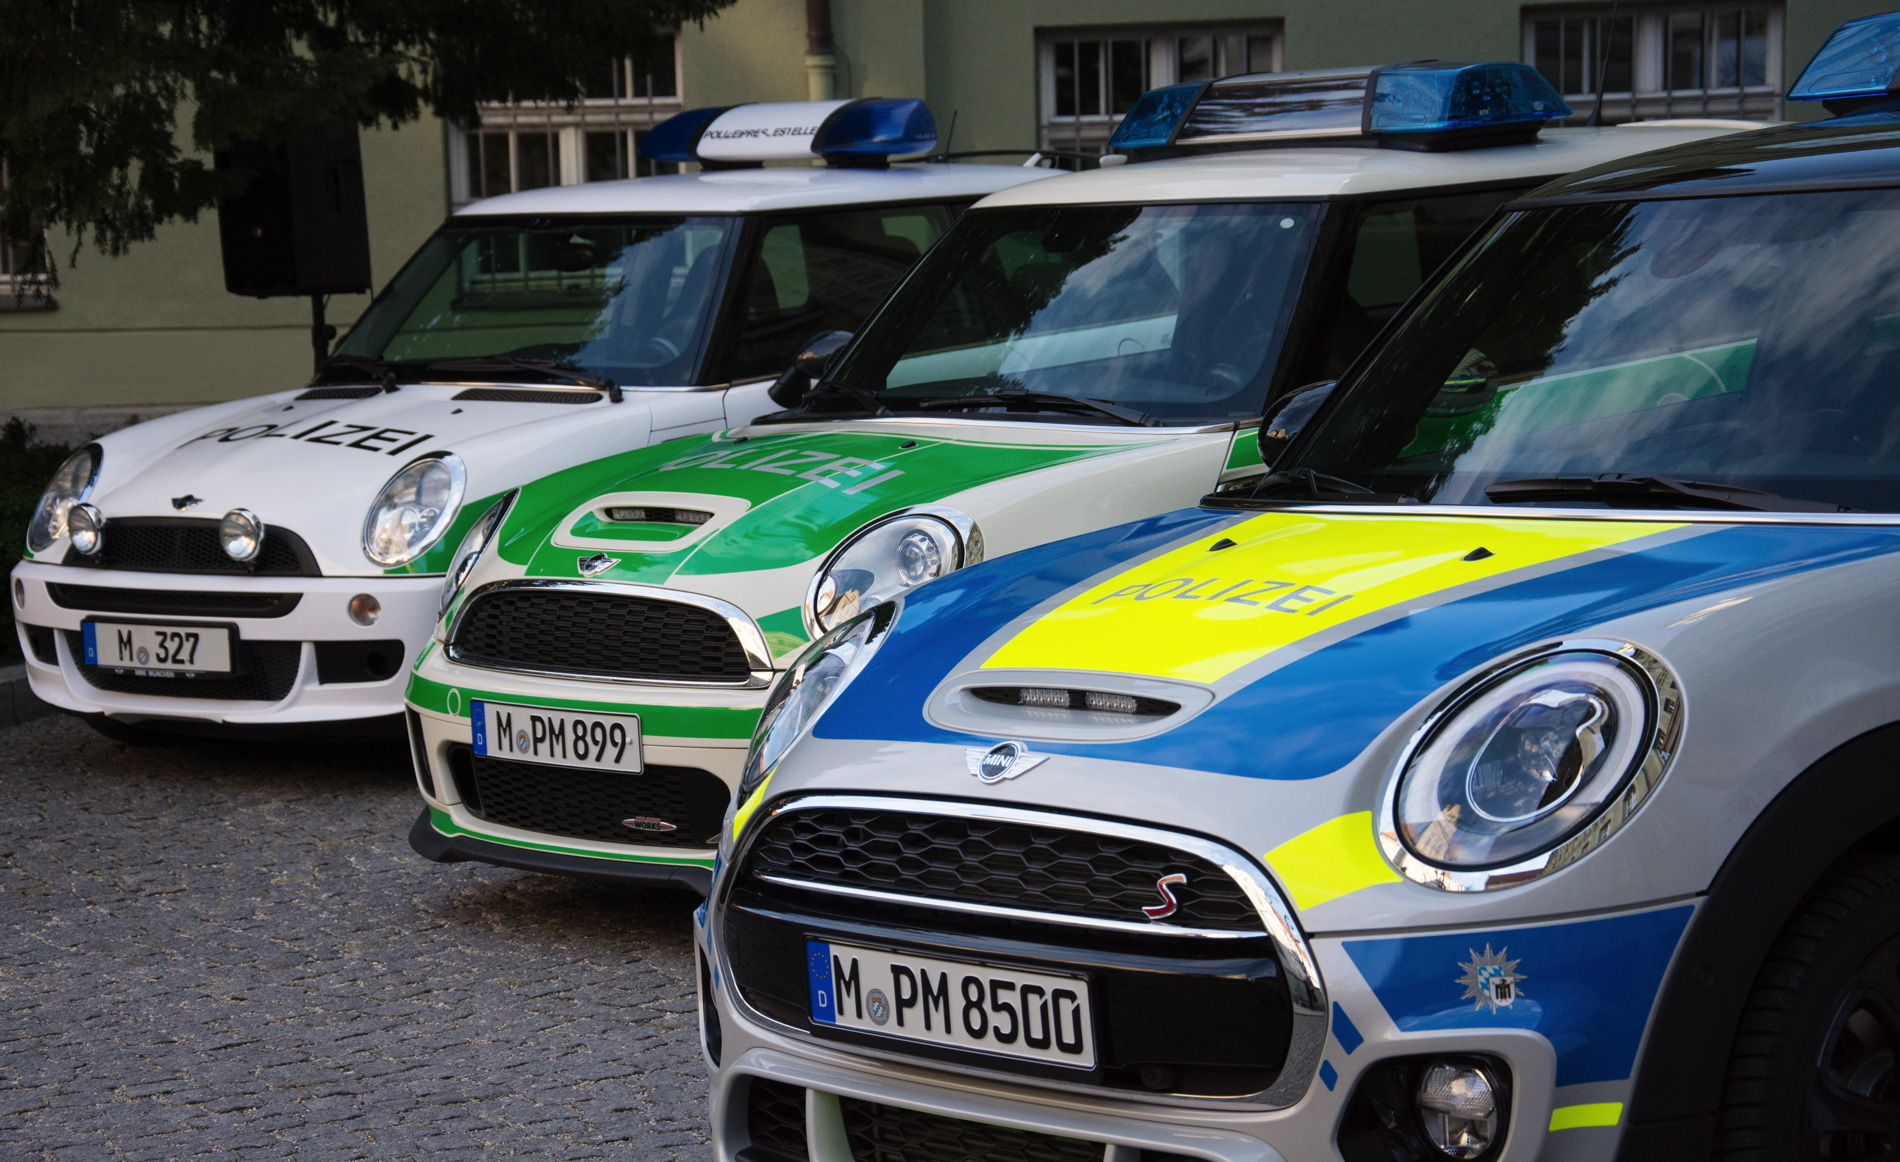 Munich Police Mini F56 Cooper S Supplements Small Car Fleet